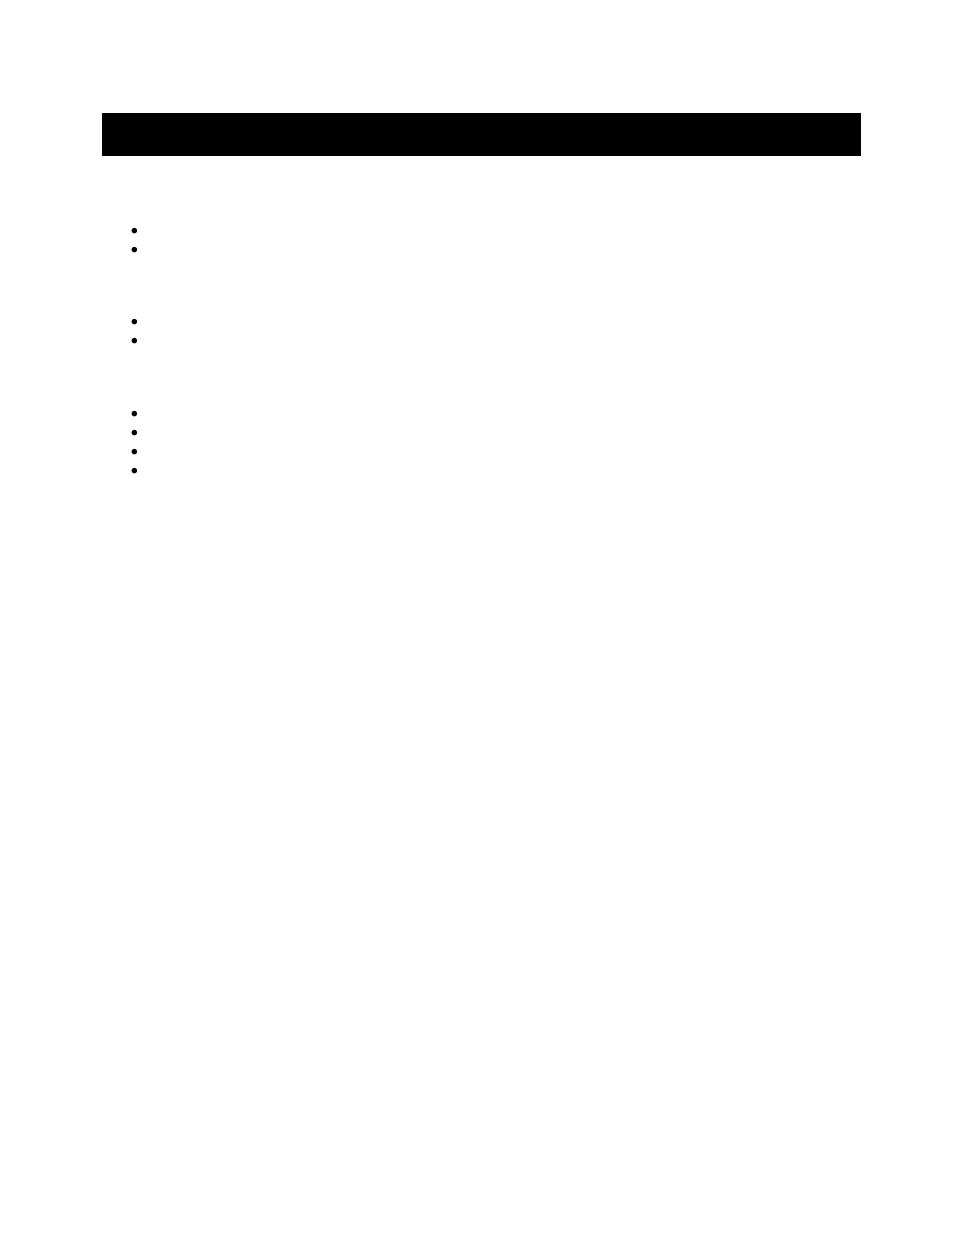 medium resolution of system orientation sky scan 2 0 omnisistem sky scan user manual page 3 11